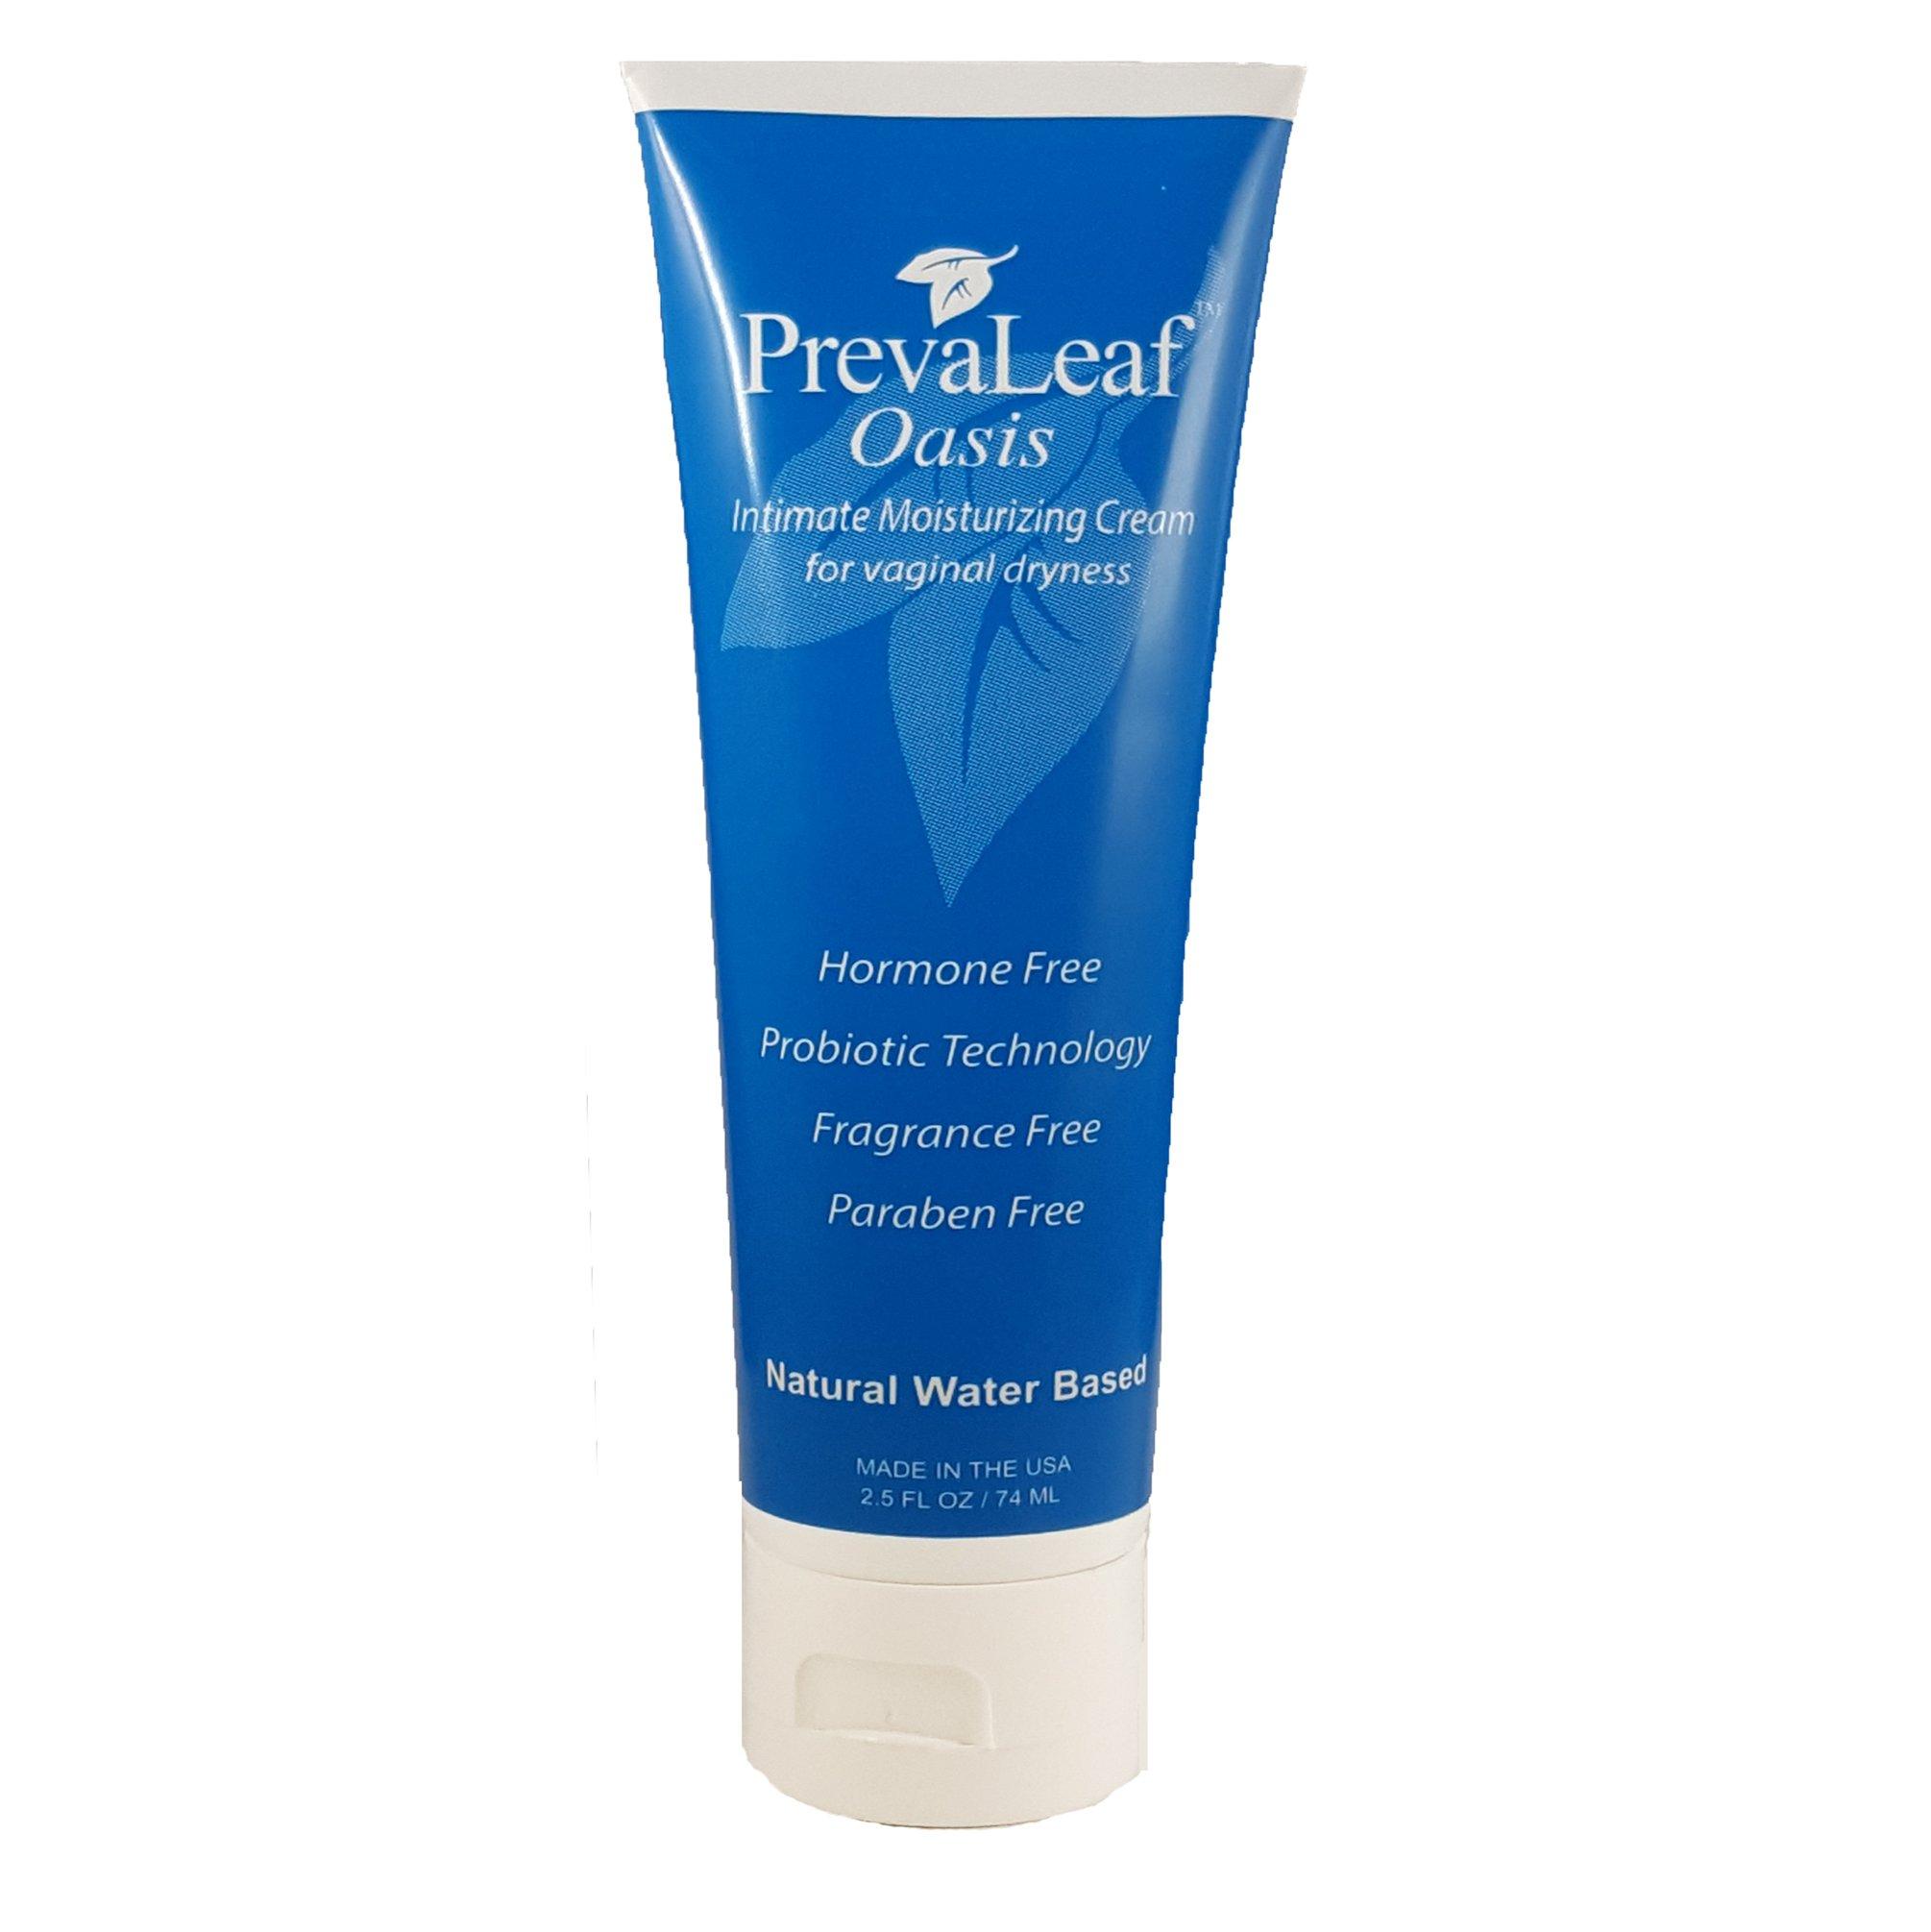 New Larger 2.5 oz Size -PrevaLeaf Oasis Natural Daily Vaginal Moisturizer with Probiotic Technology